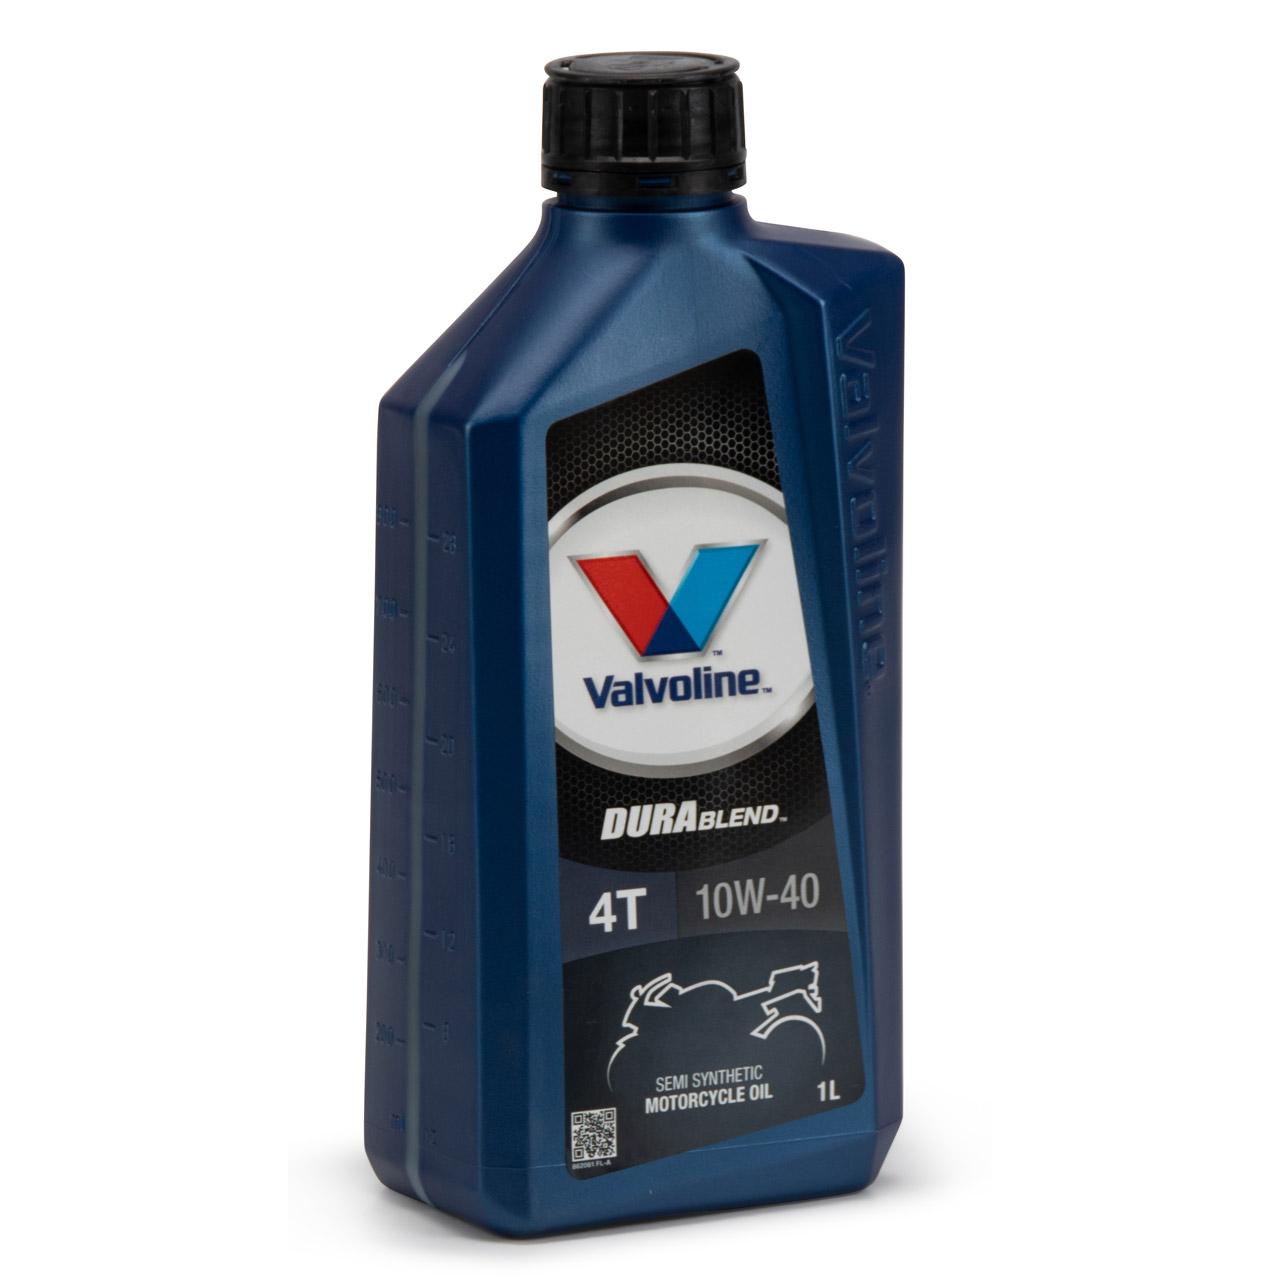 VALVOLINE Motoröl ÖL DURABLEND 4-TAKT 10W40 API SL JASO MA MA-2 - 1L 1 Liter